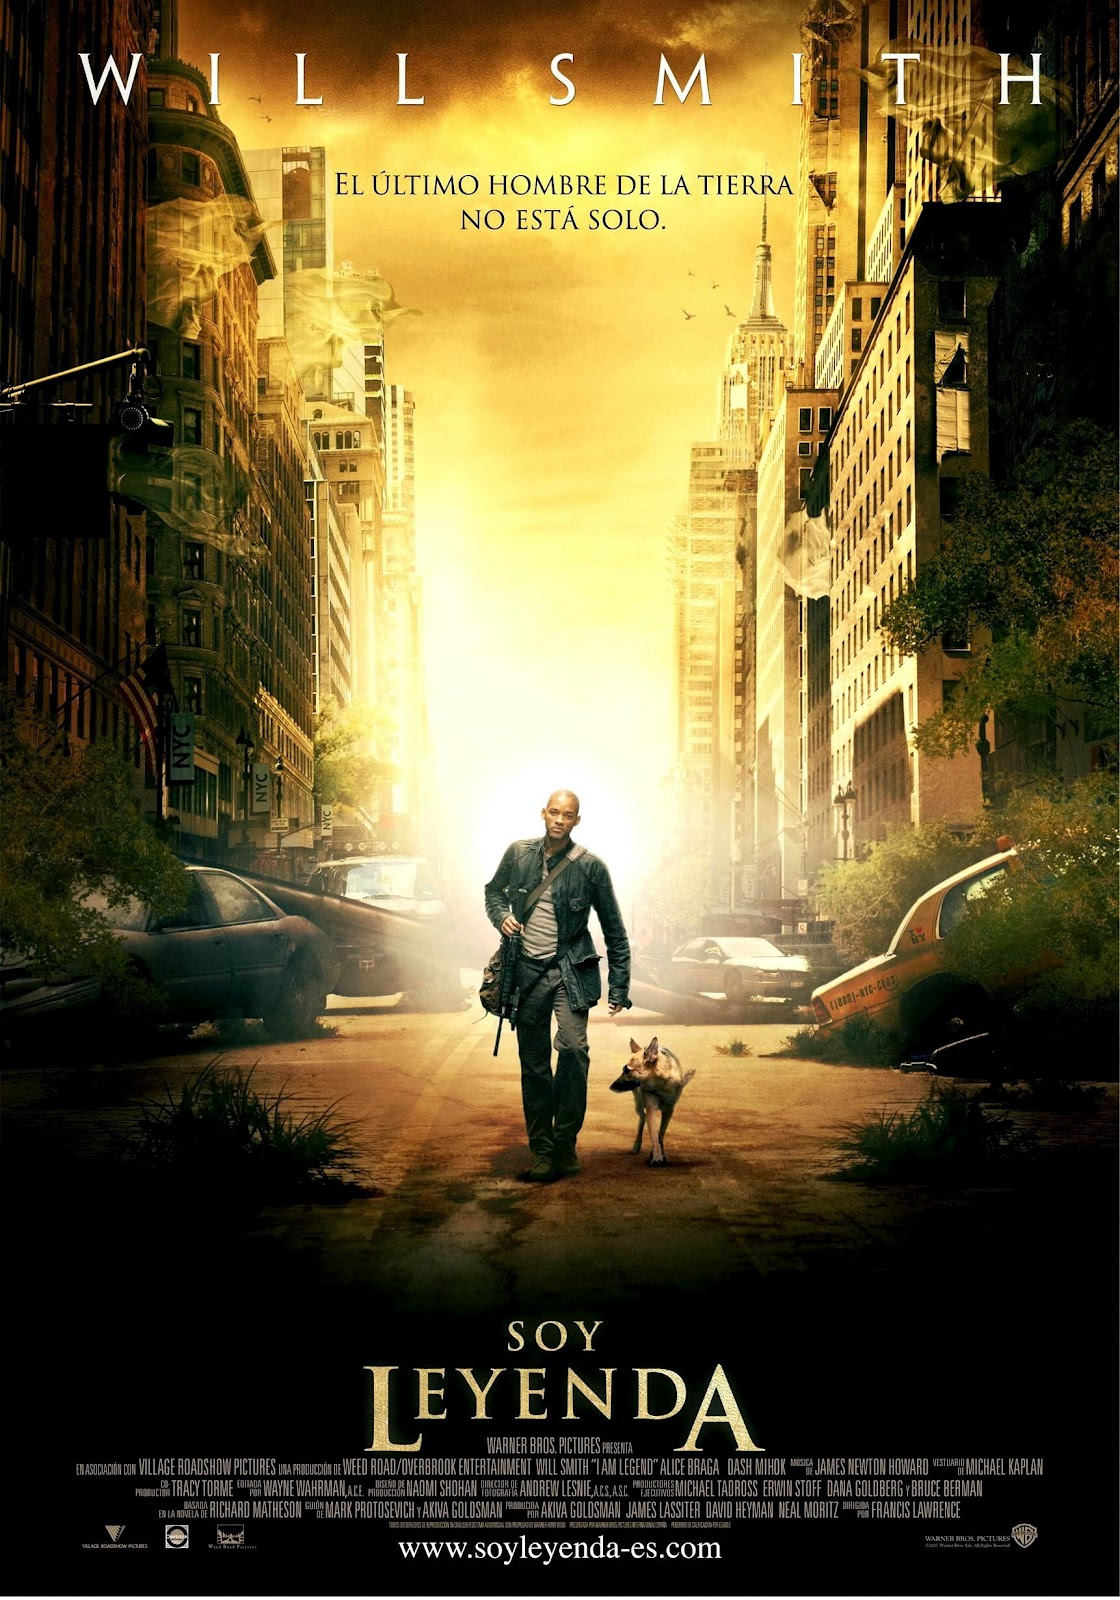 Soy leyenda (2007)